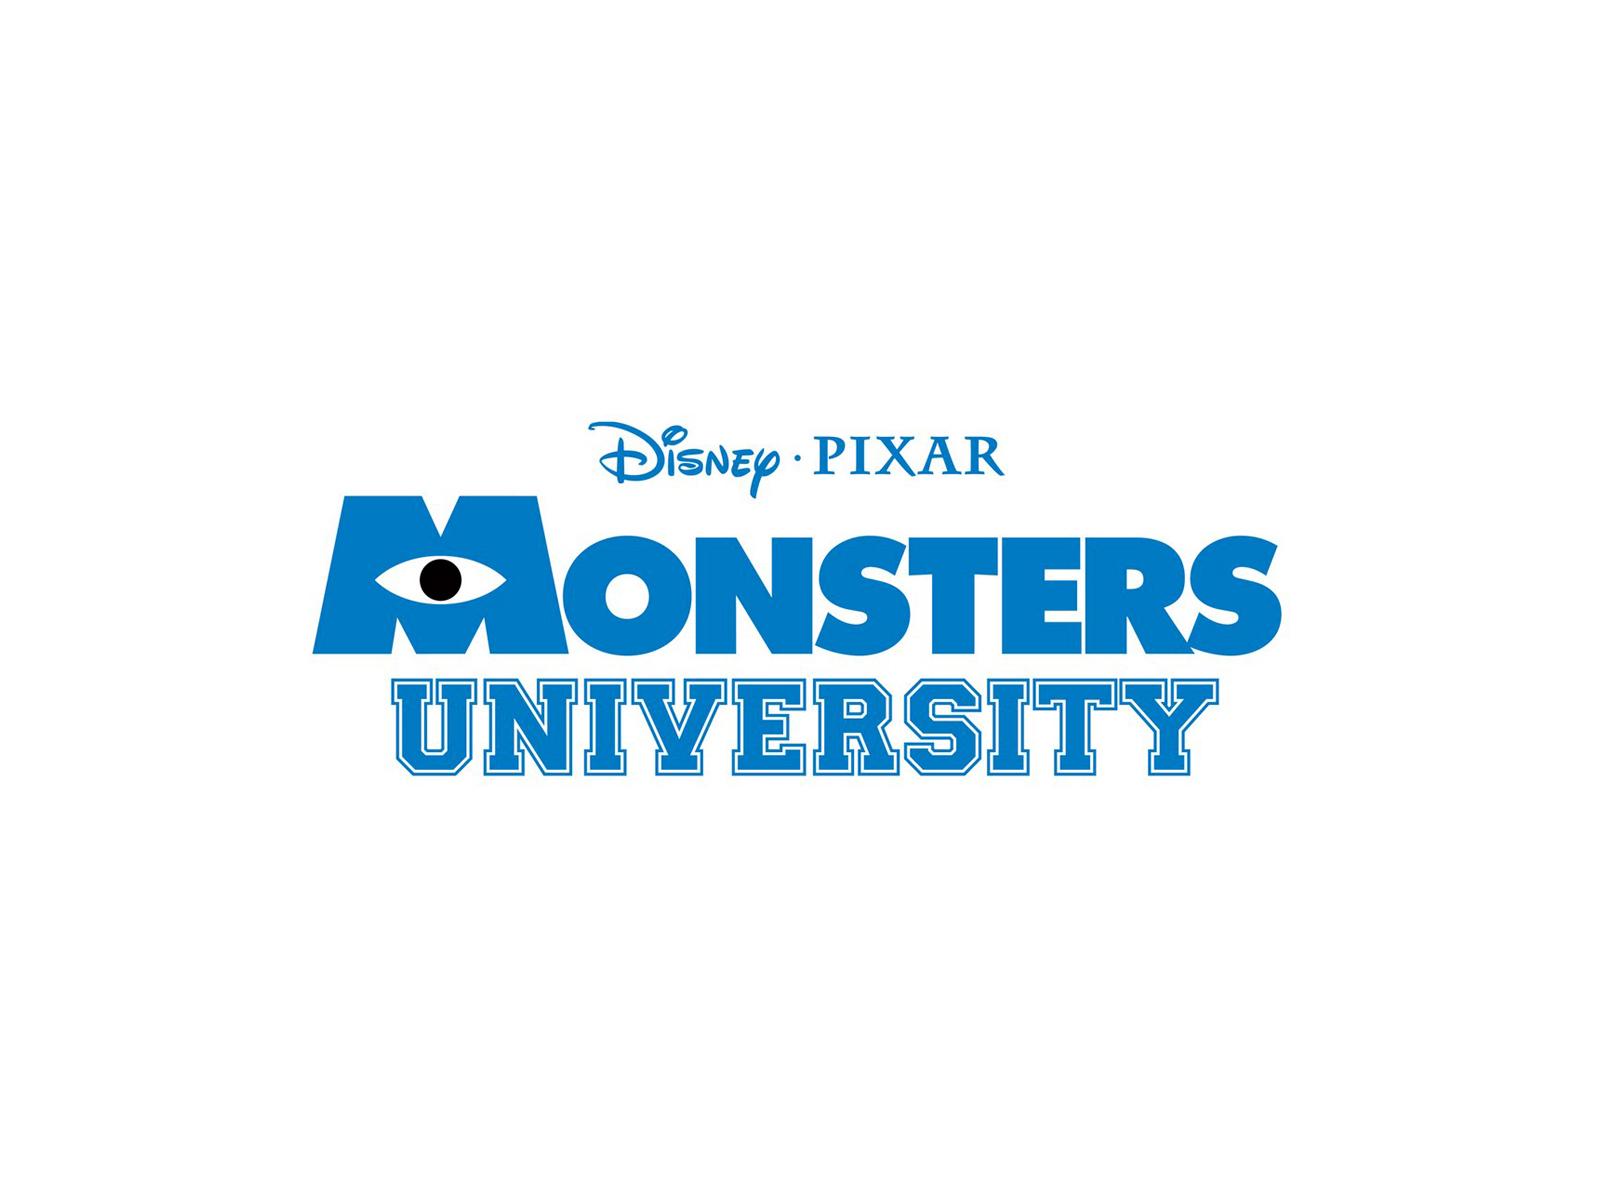 http://1.bp.blogspot.com/-YsLwxNUVBfk/UMTlRsMOUJI/AAAAAAAAGlo/JuomvEtXGtQ/s1600/Monsters-Univercity-Animation-Logo-HD-Wallpaper_Vvallpaper.Net.jpg